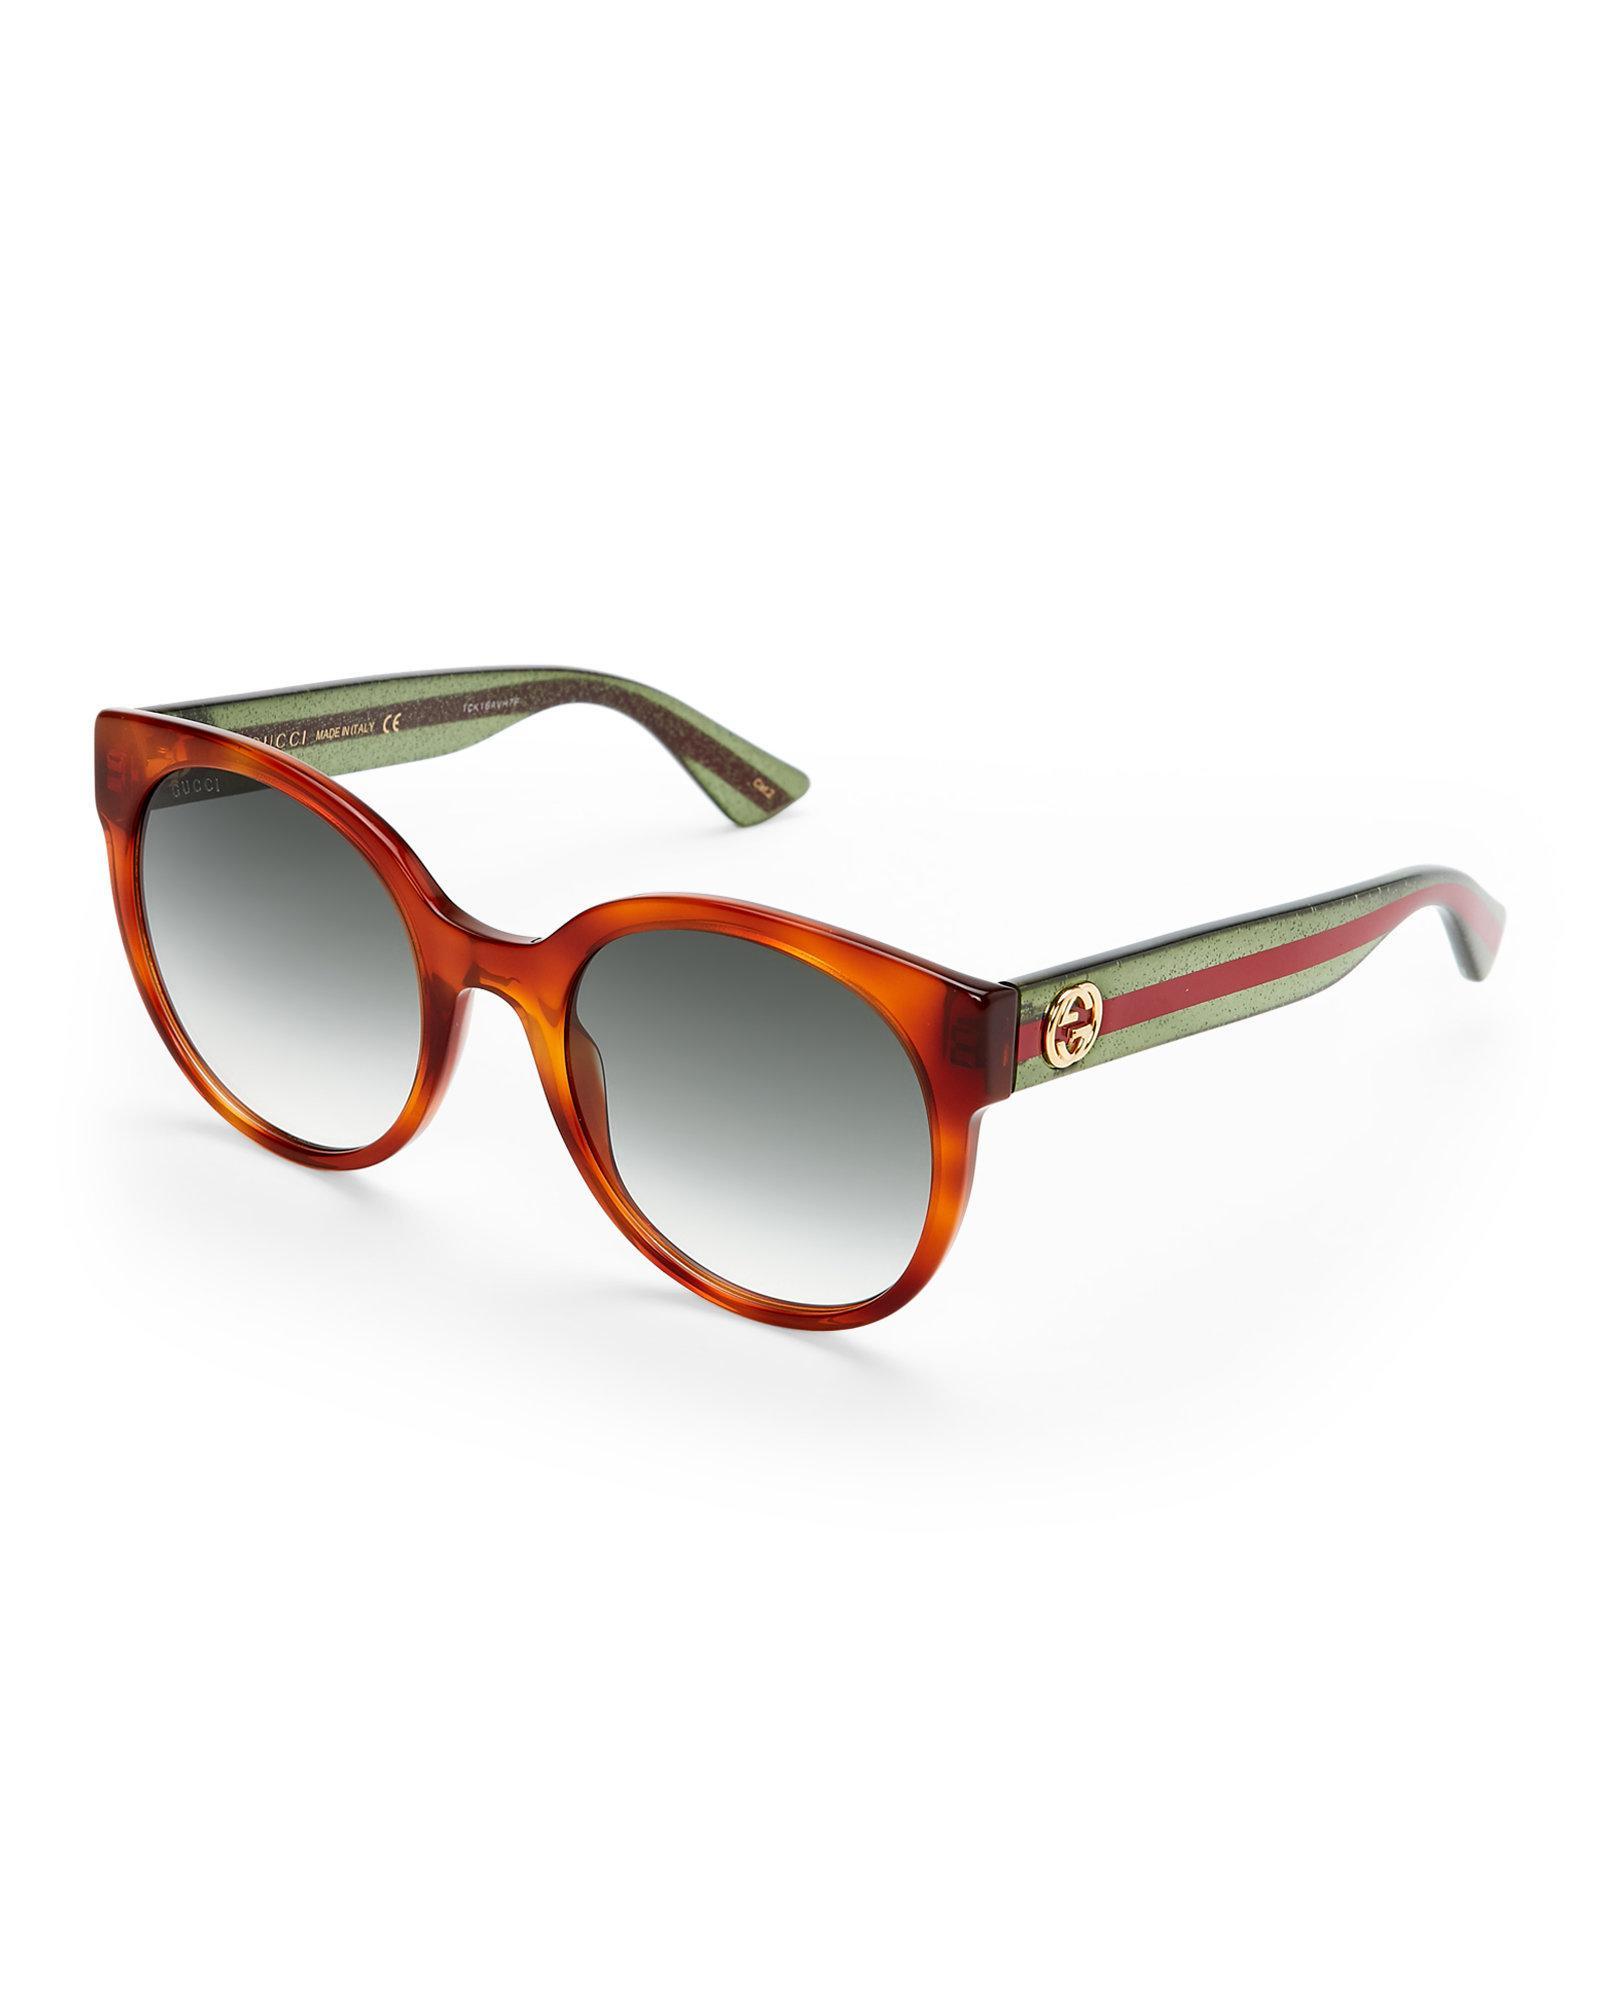 2526673dac8 Lyst - Gucci Gg 0035 S Havana Round Sunglasses in Brown